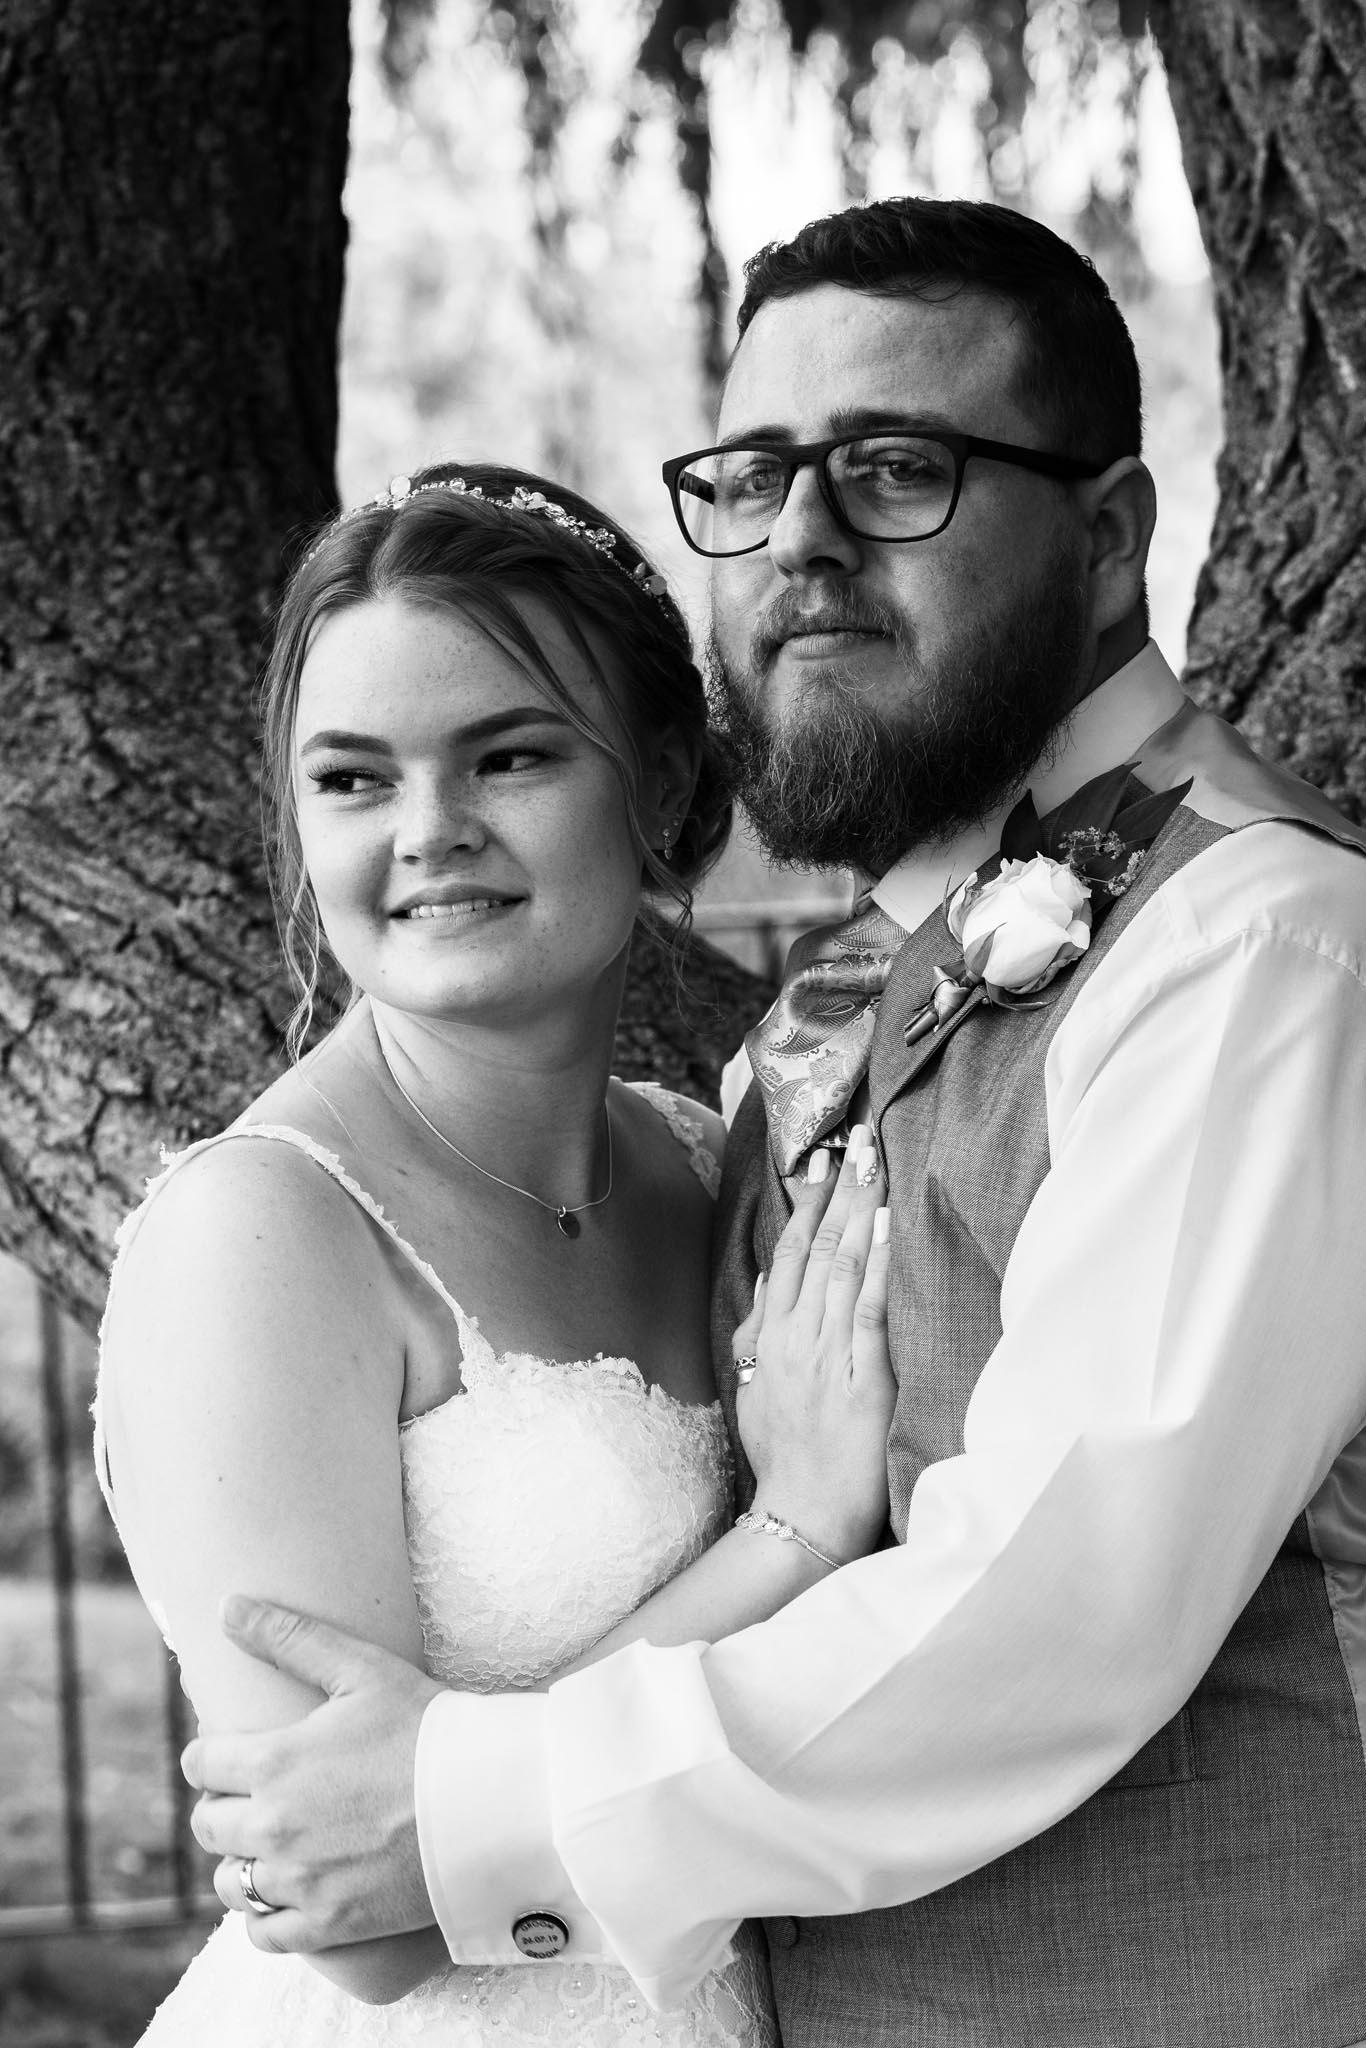 594-Bride-groom-Luke-Yasmin-The-Rayleigh-Club-Wedding-Photography.jpg